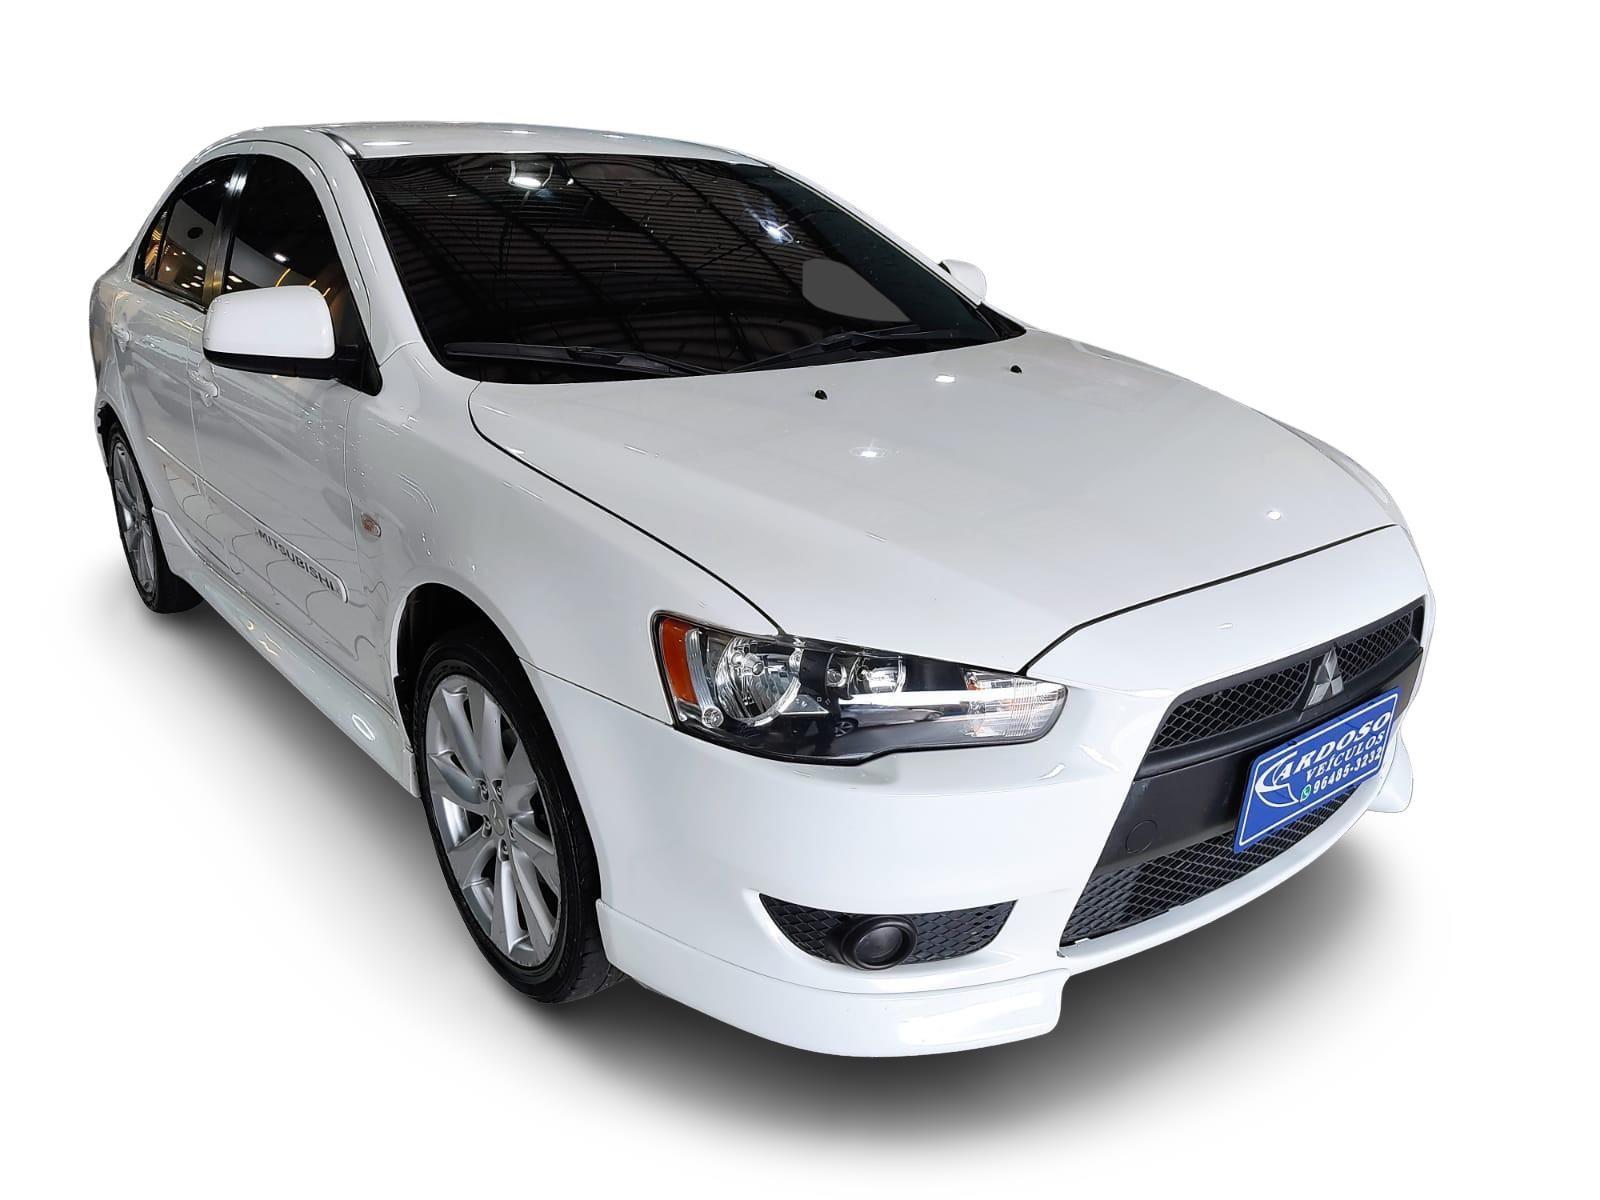 //www.autoline.com.br/carro/mitsubishi/lancer-20-sedan-16v-gasolina-4p-cvt/2012/carapicuiba-sp/15707642